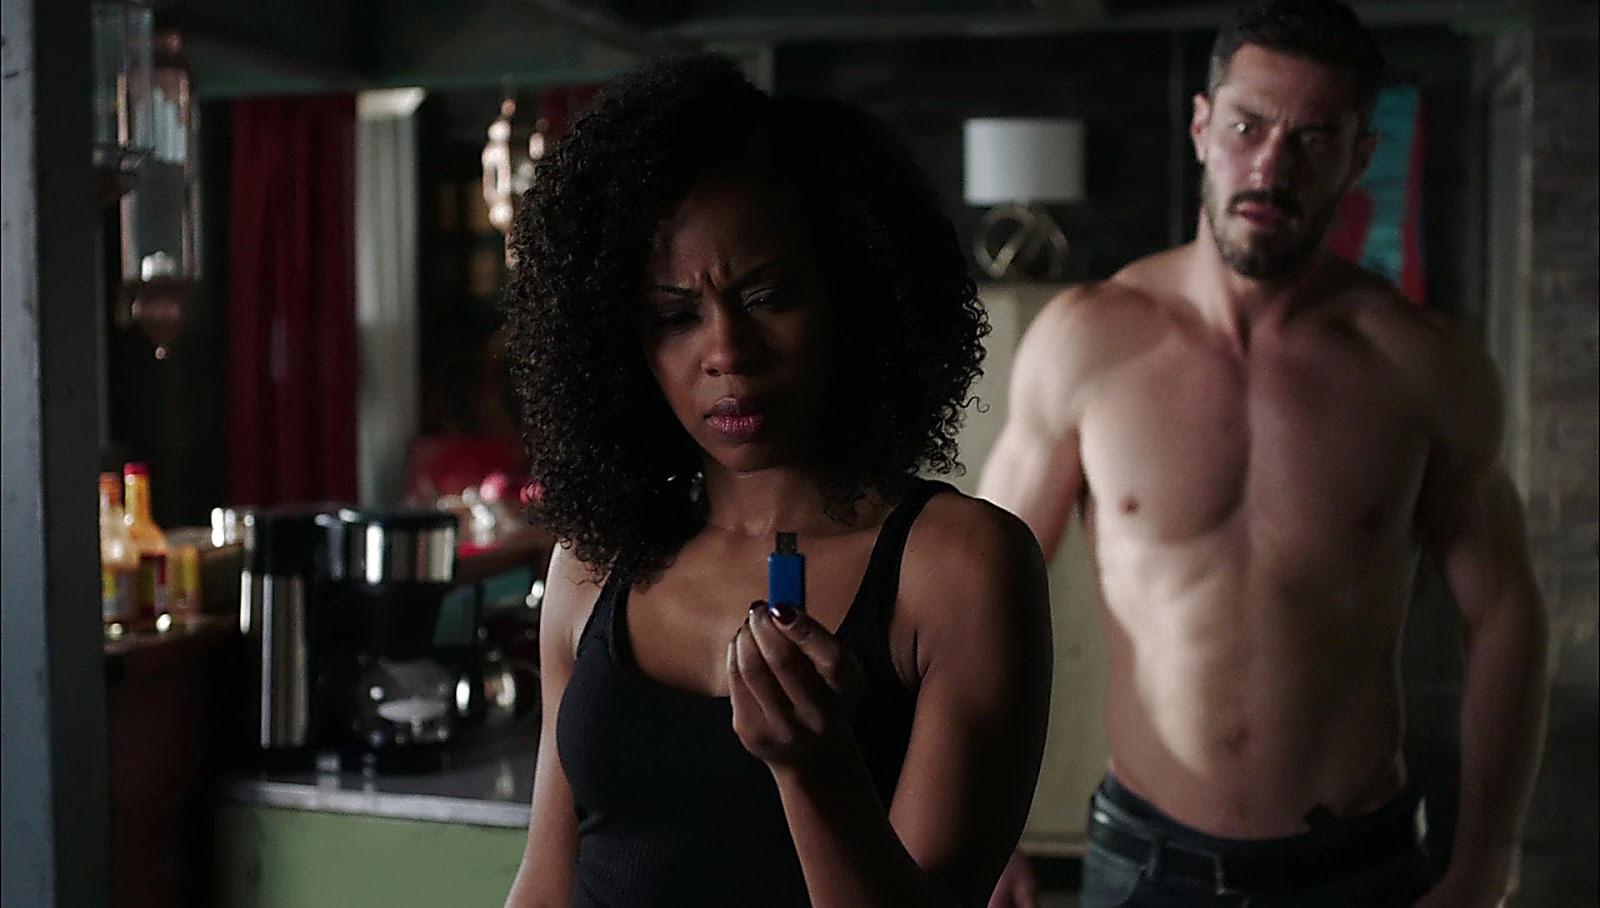 Brandon Quinn sexy shirtless scene May 10, 2017, 12pm